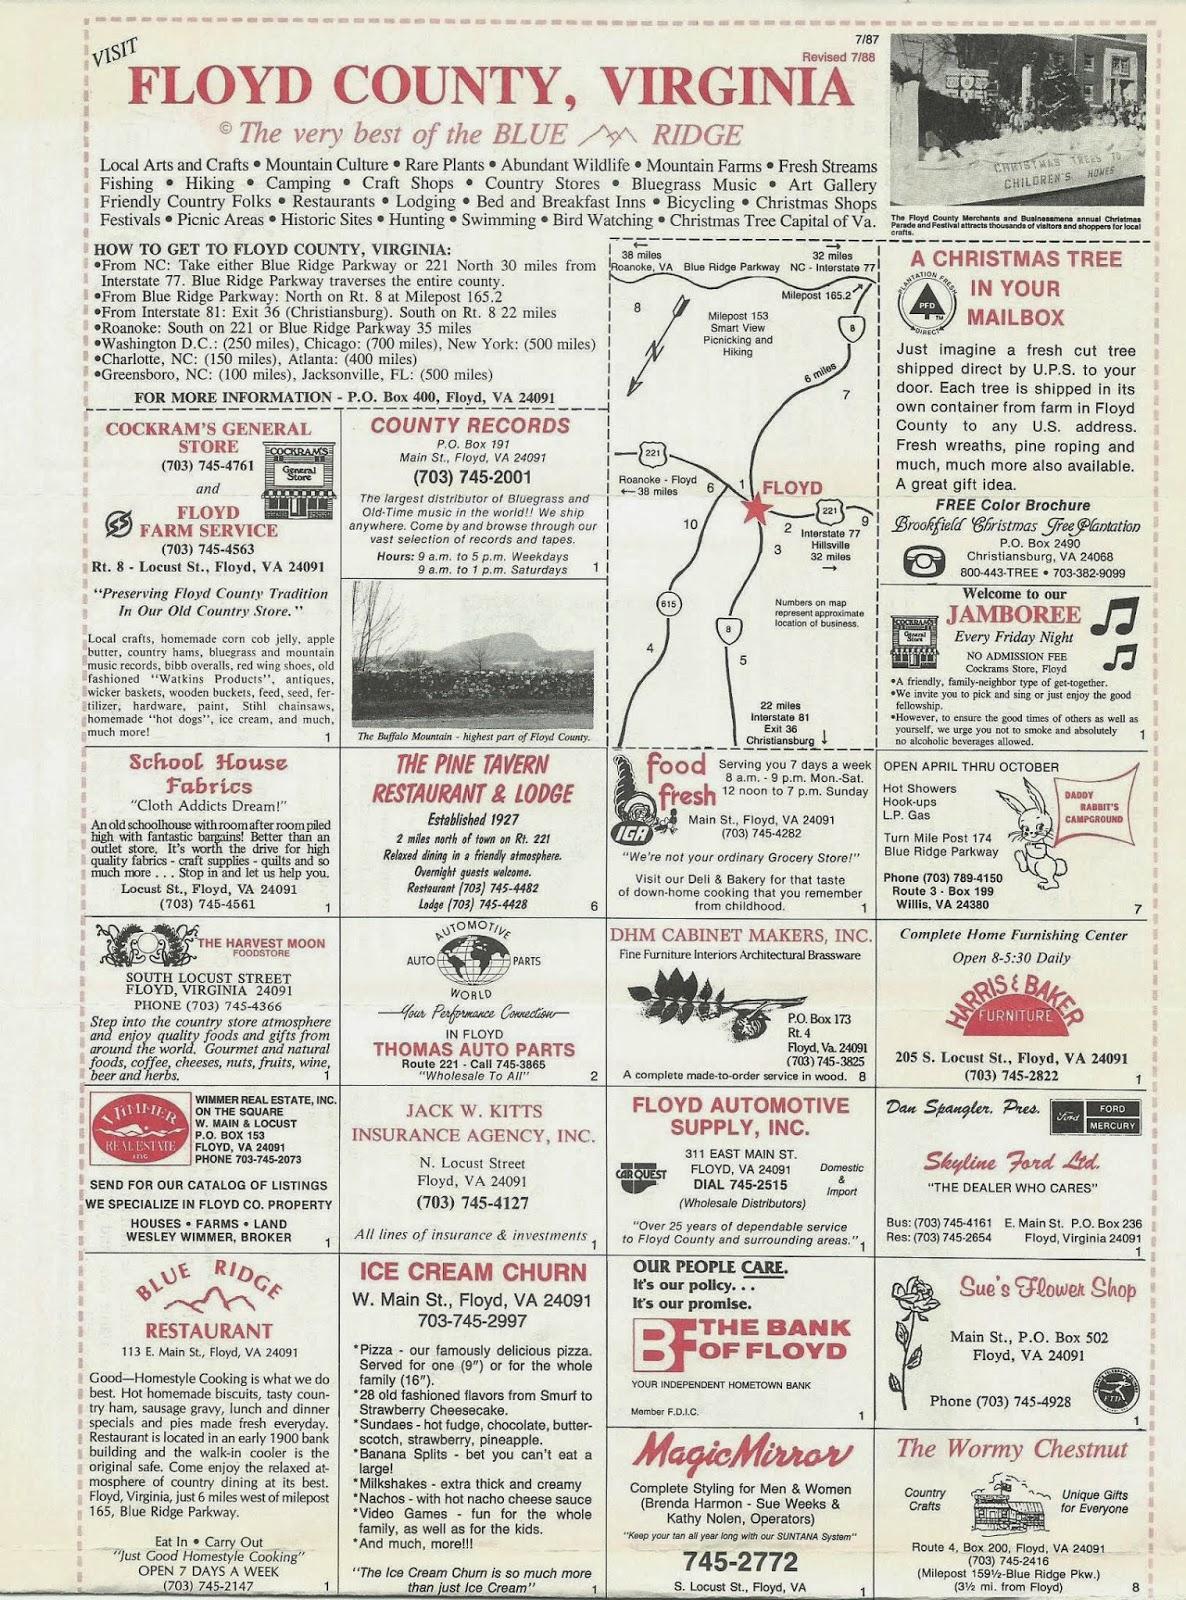 Floyd County VA brochure